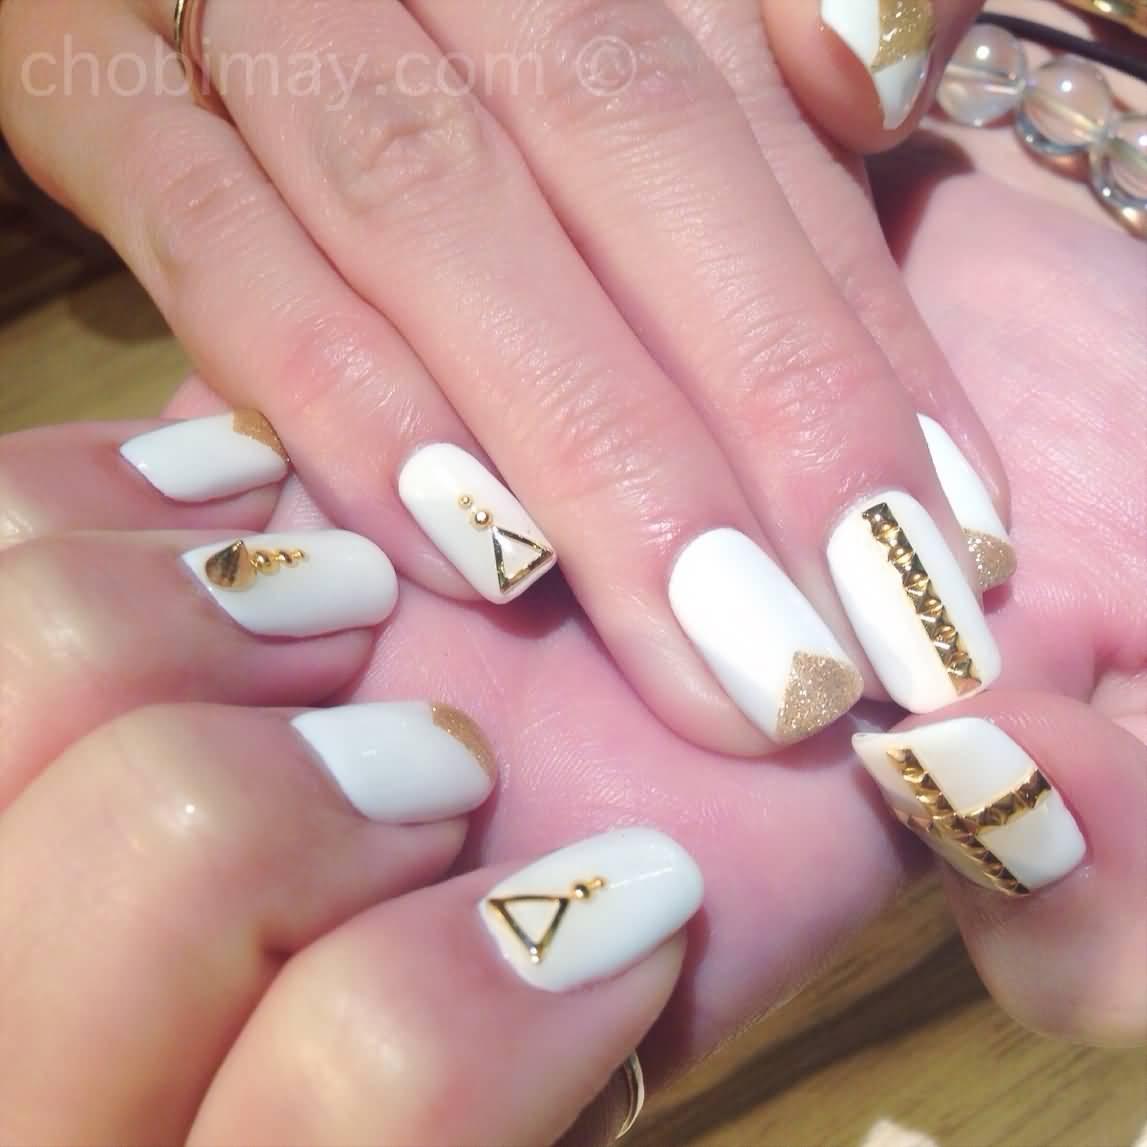 55+ Stylish White And Gold Nail Art Design Ideas